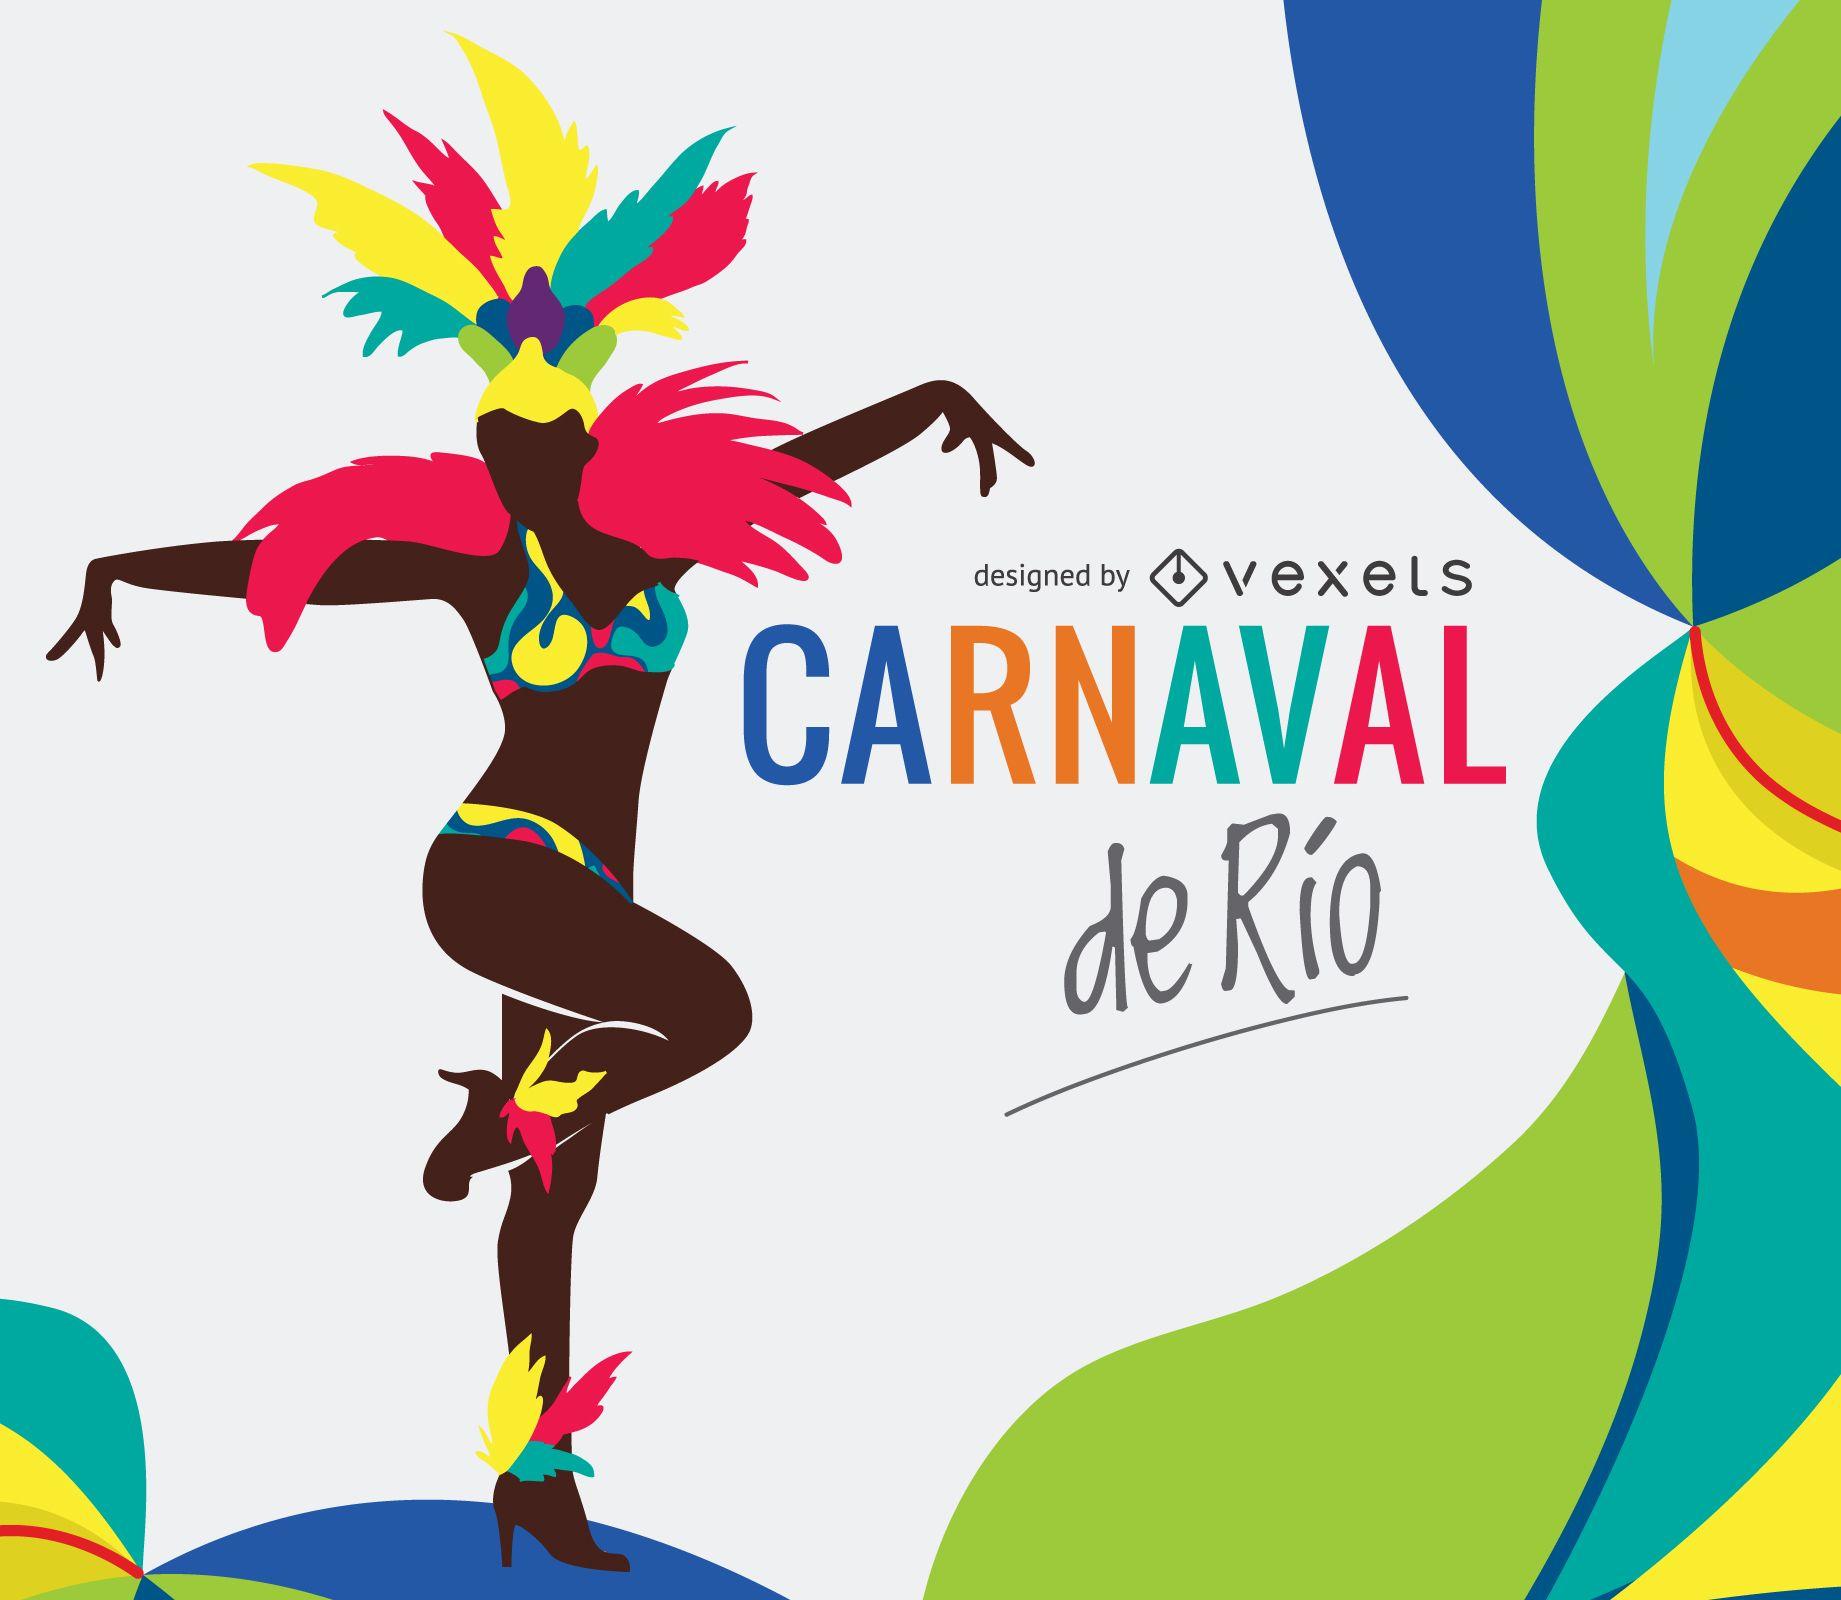 Carnaval de Rio dancer illustration